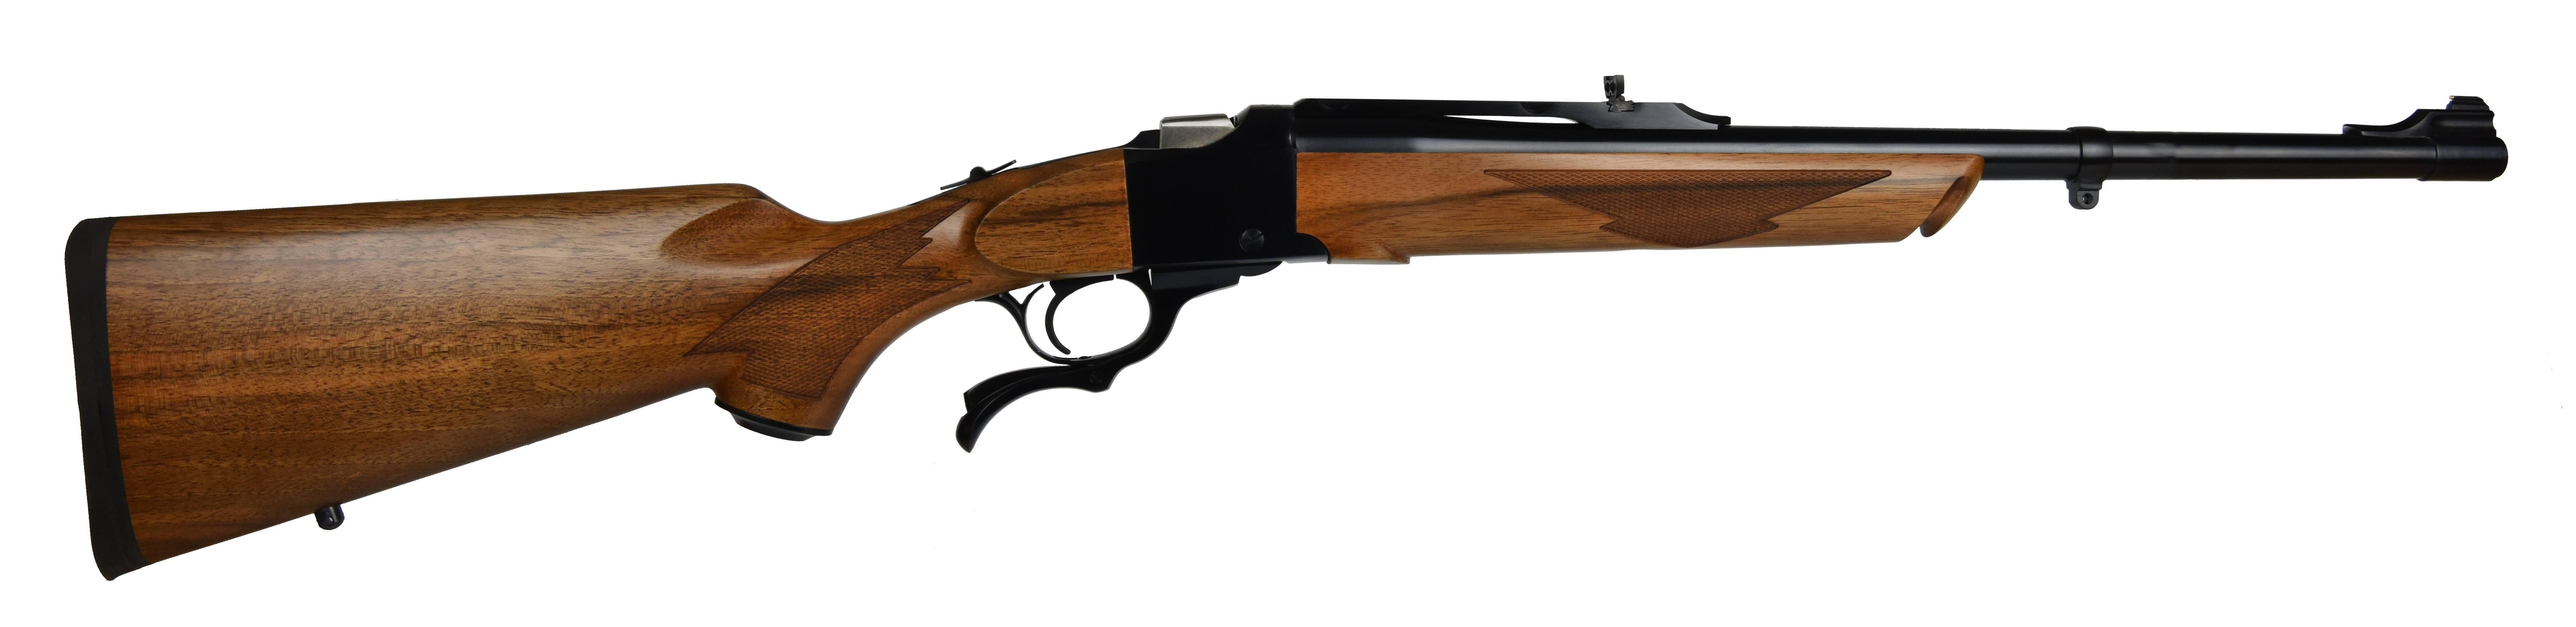 Ruger No. 1S Medium Sporter 460 S&W Magnum